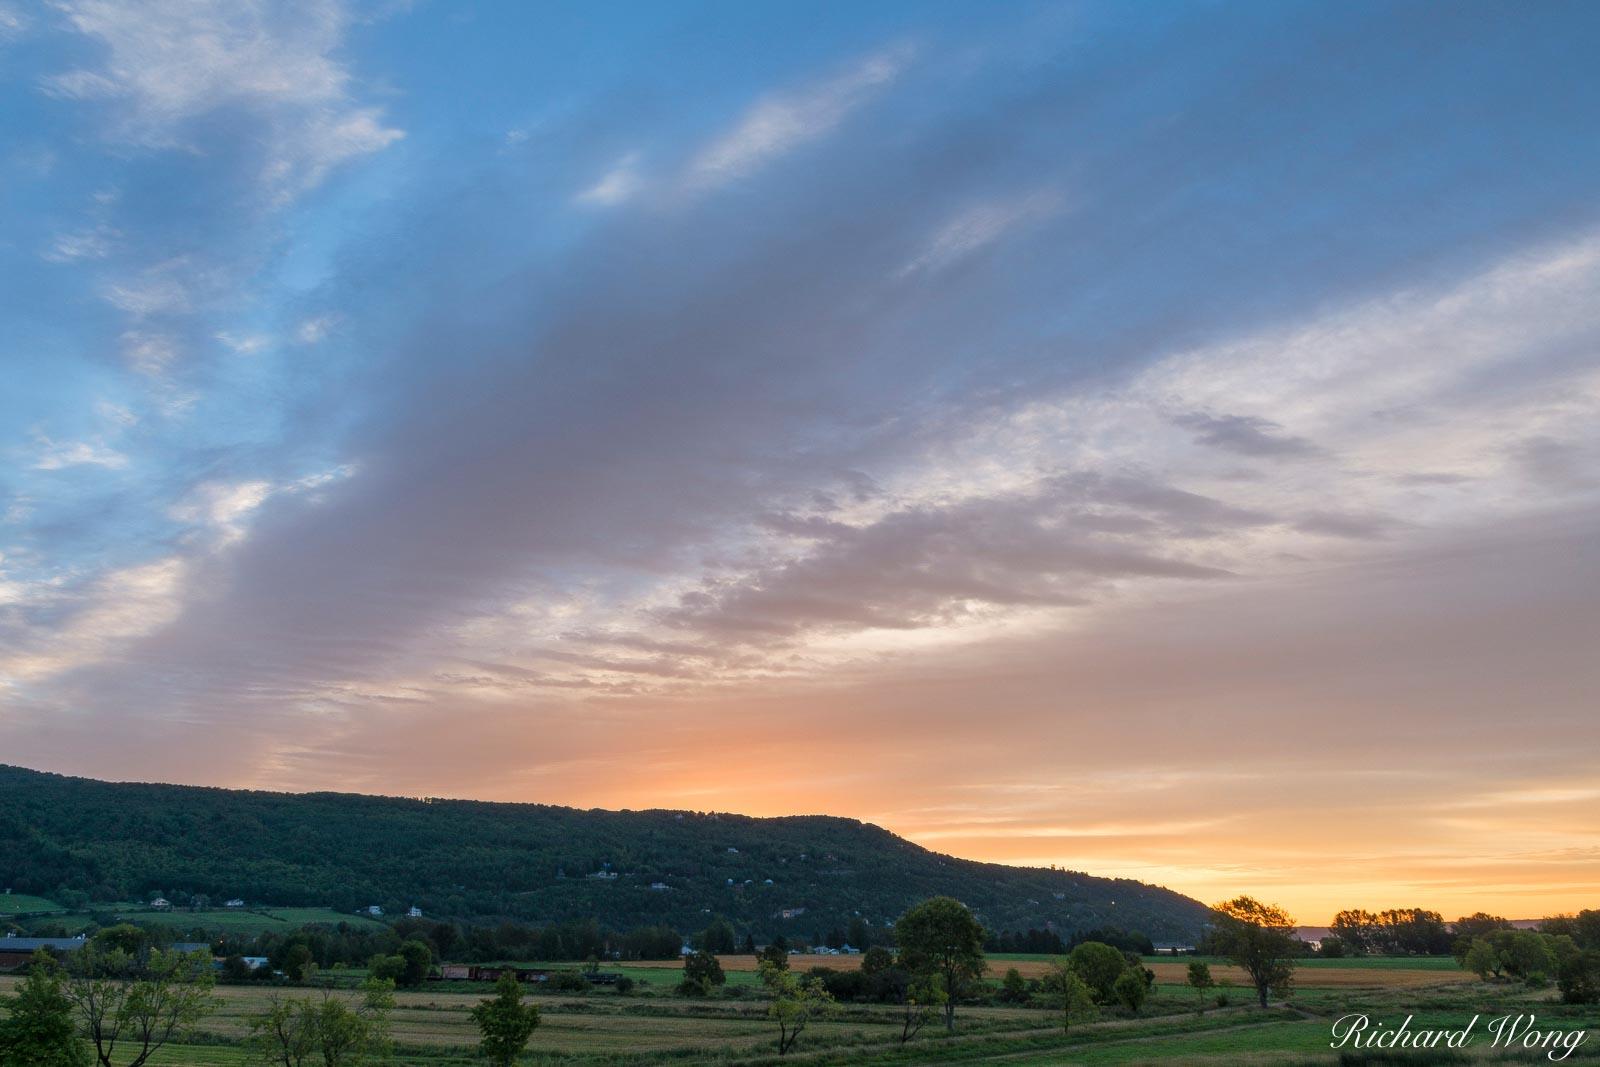 Baie-Saint-Paul Farmlands at Sunrise, Quebec, Canada, photo, photo